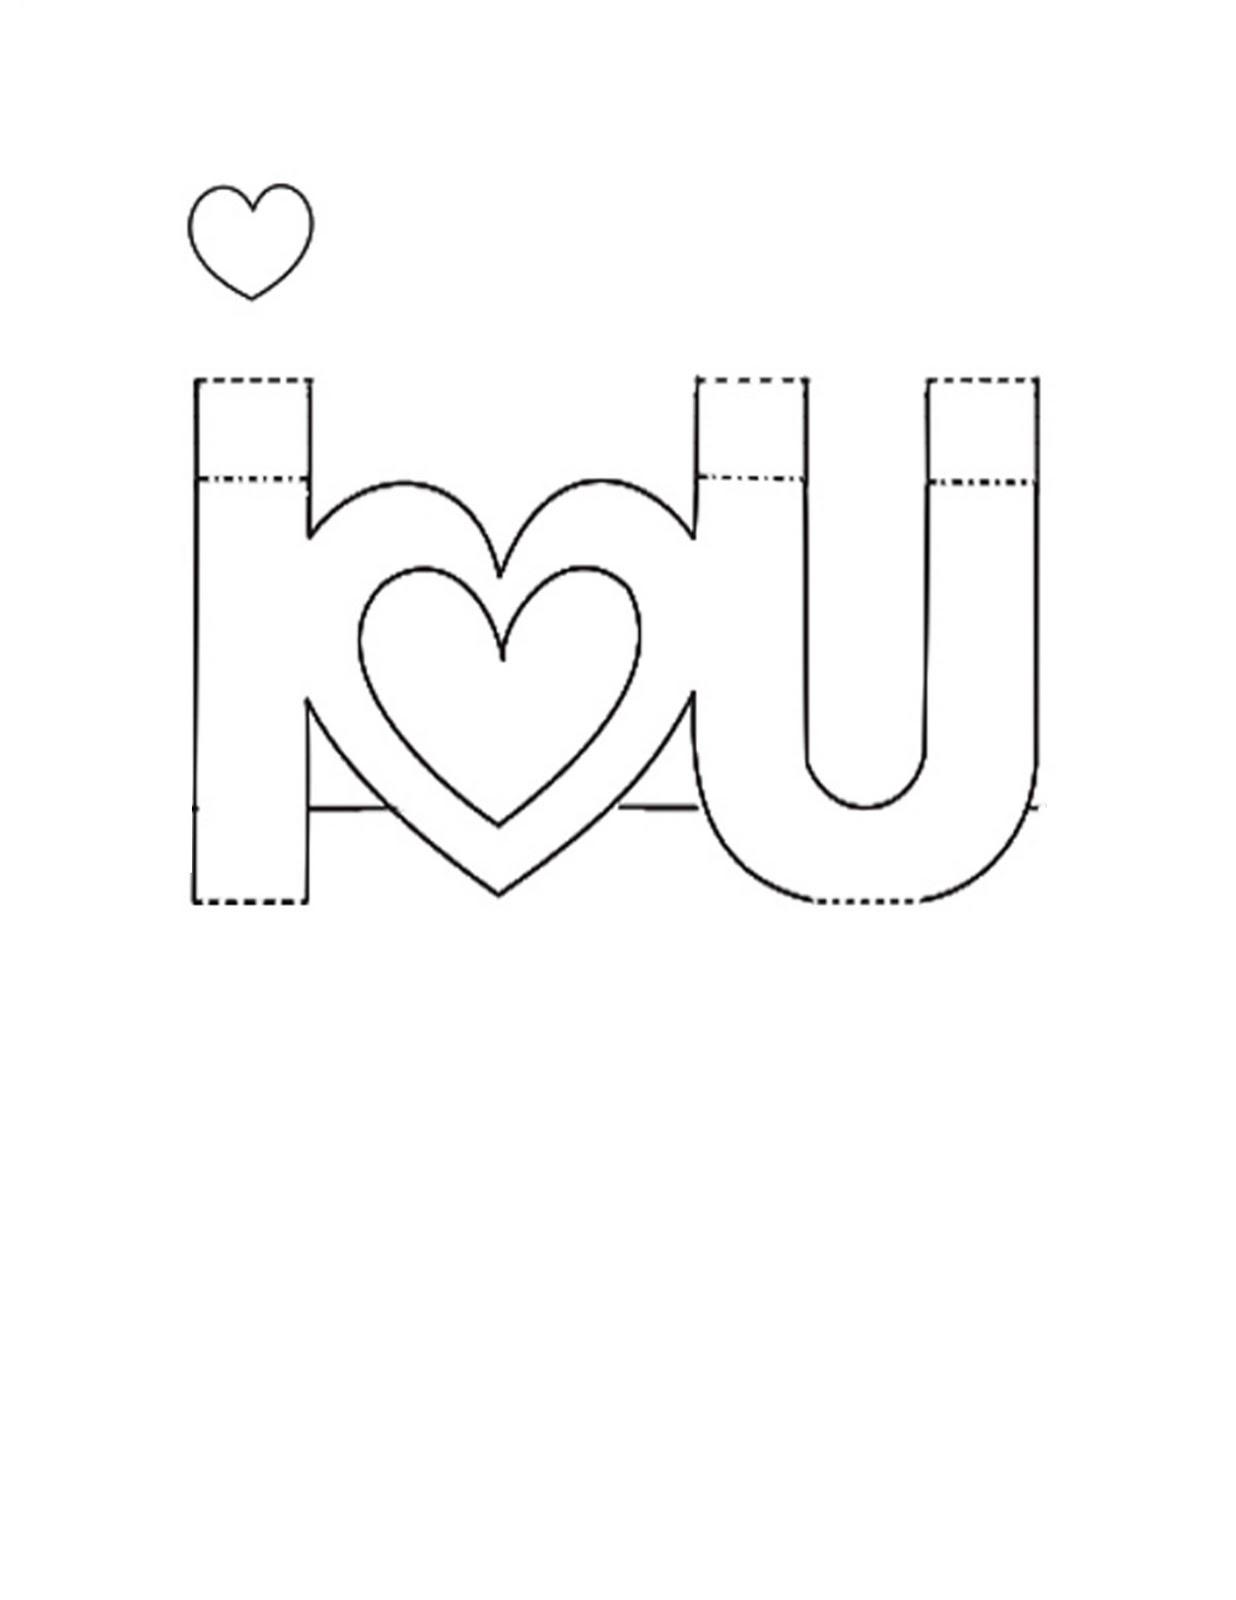 Becca Creative: Pop-up Valentine's Day Card